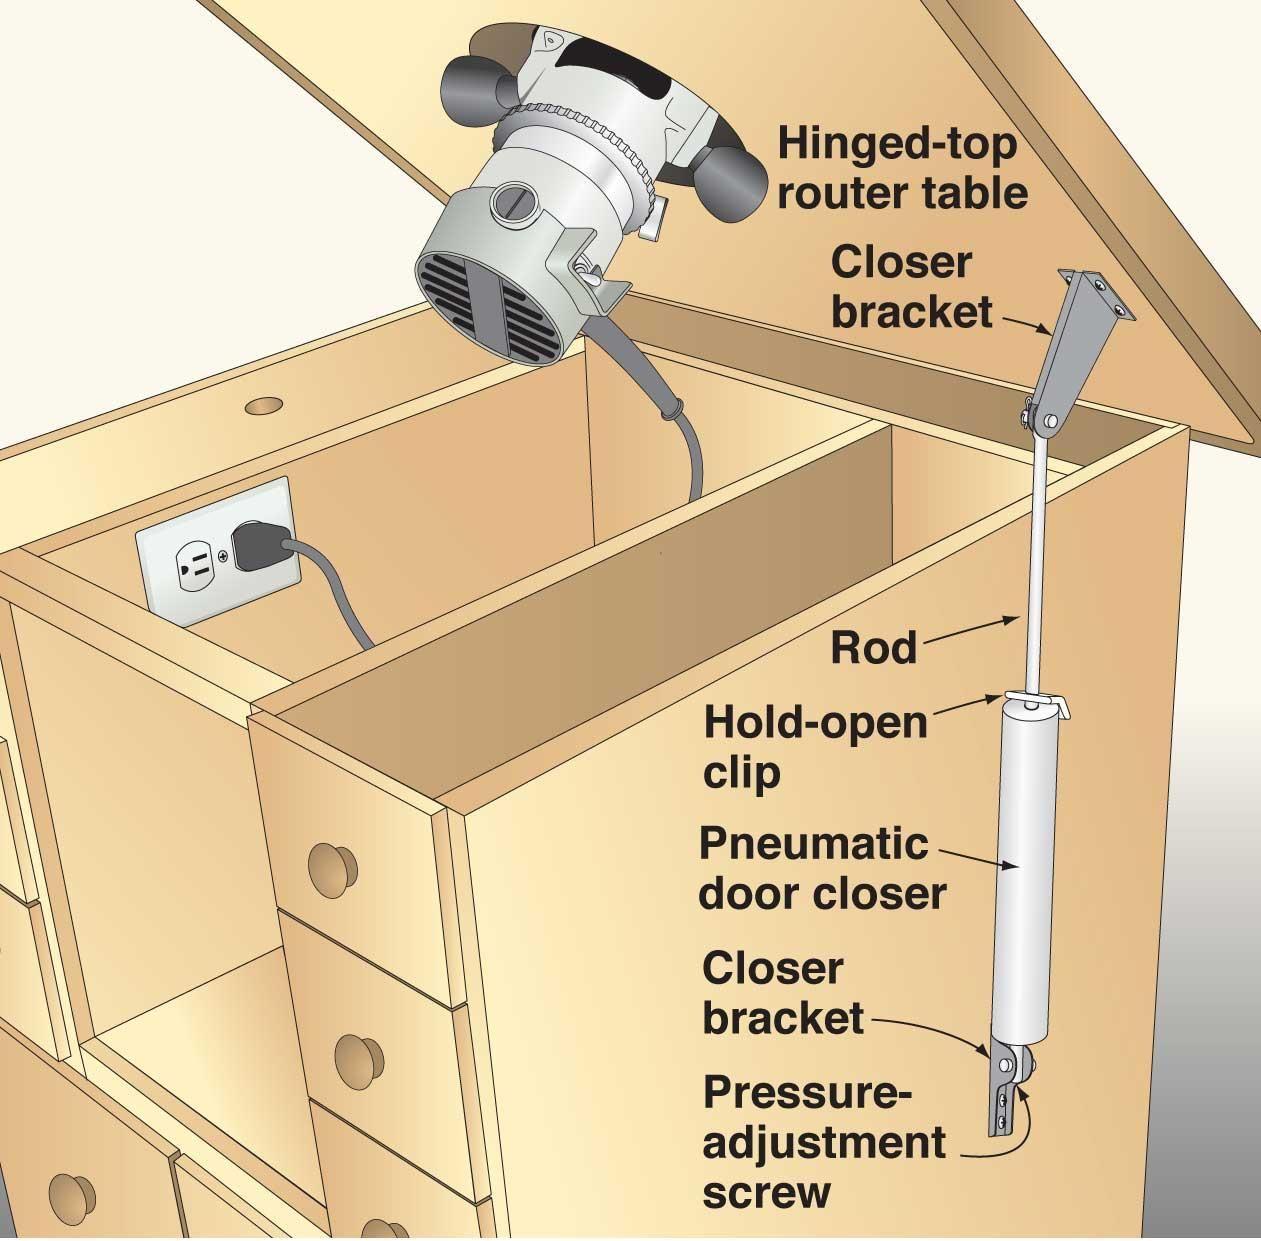 Lift assist help for tilt top router tables wood magazine lift assist help for tilt top router tables wood magazine keyboard keysfo Images